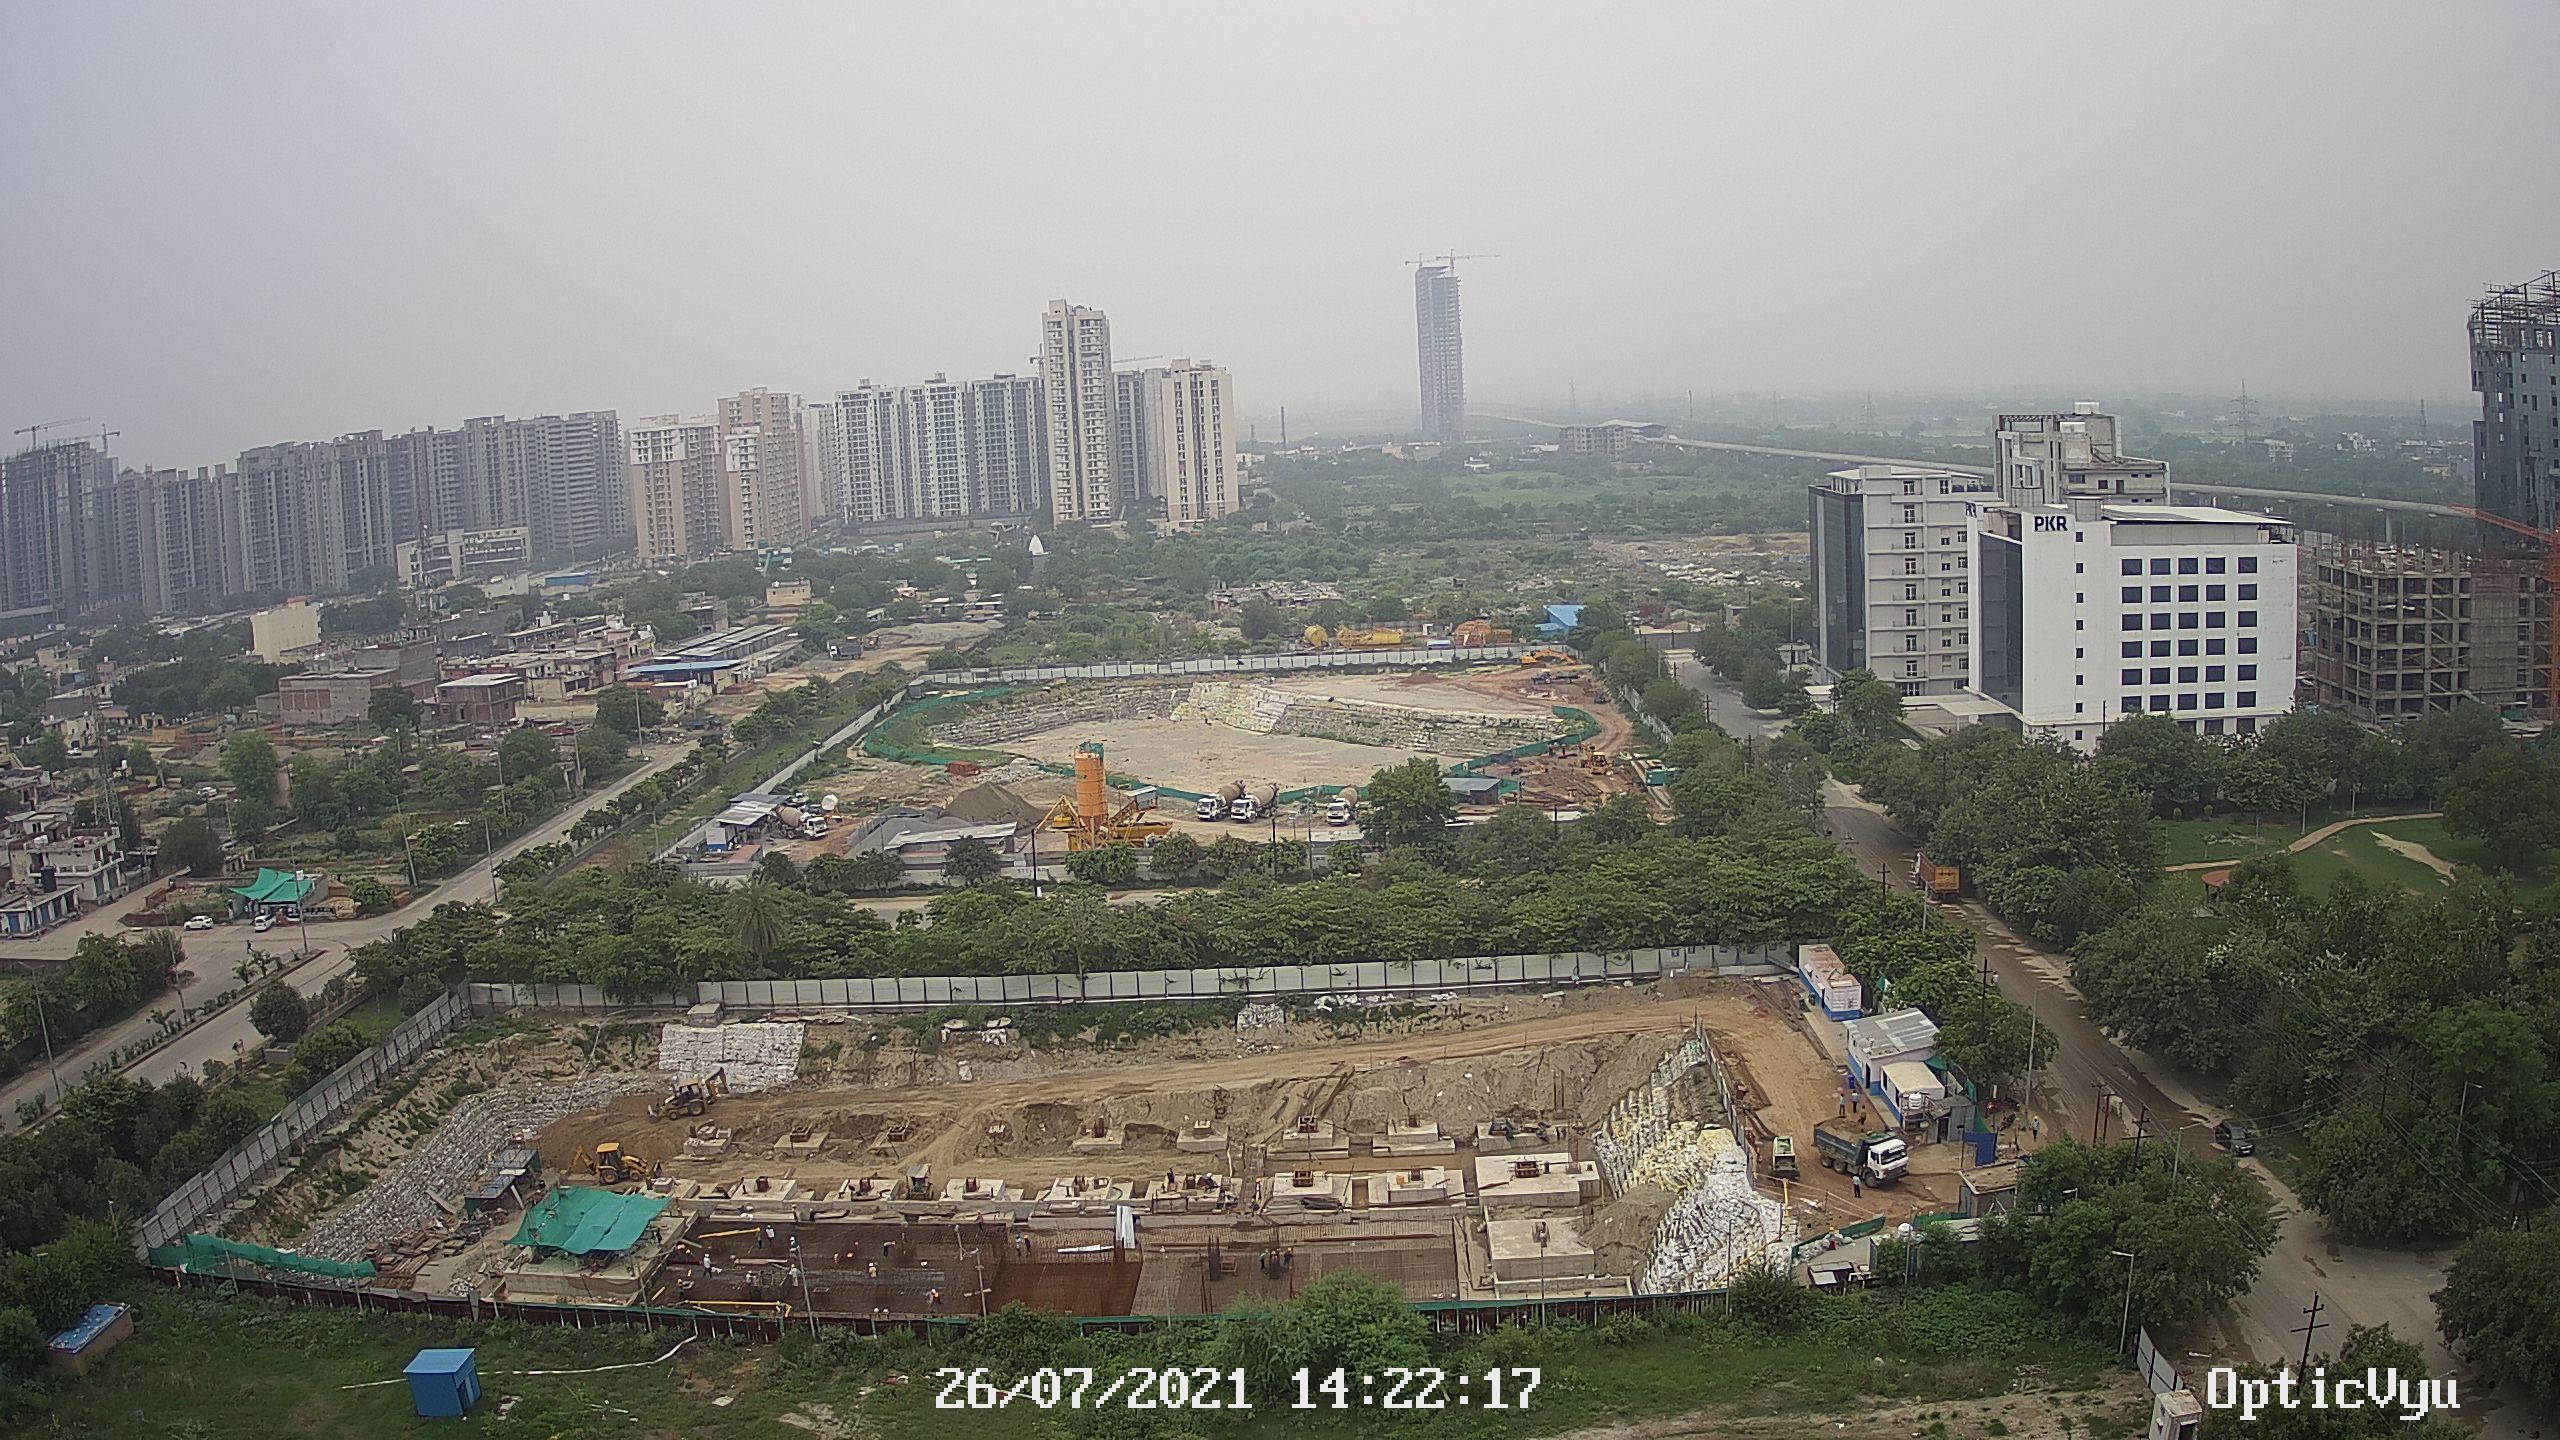 LNT NGO construction site